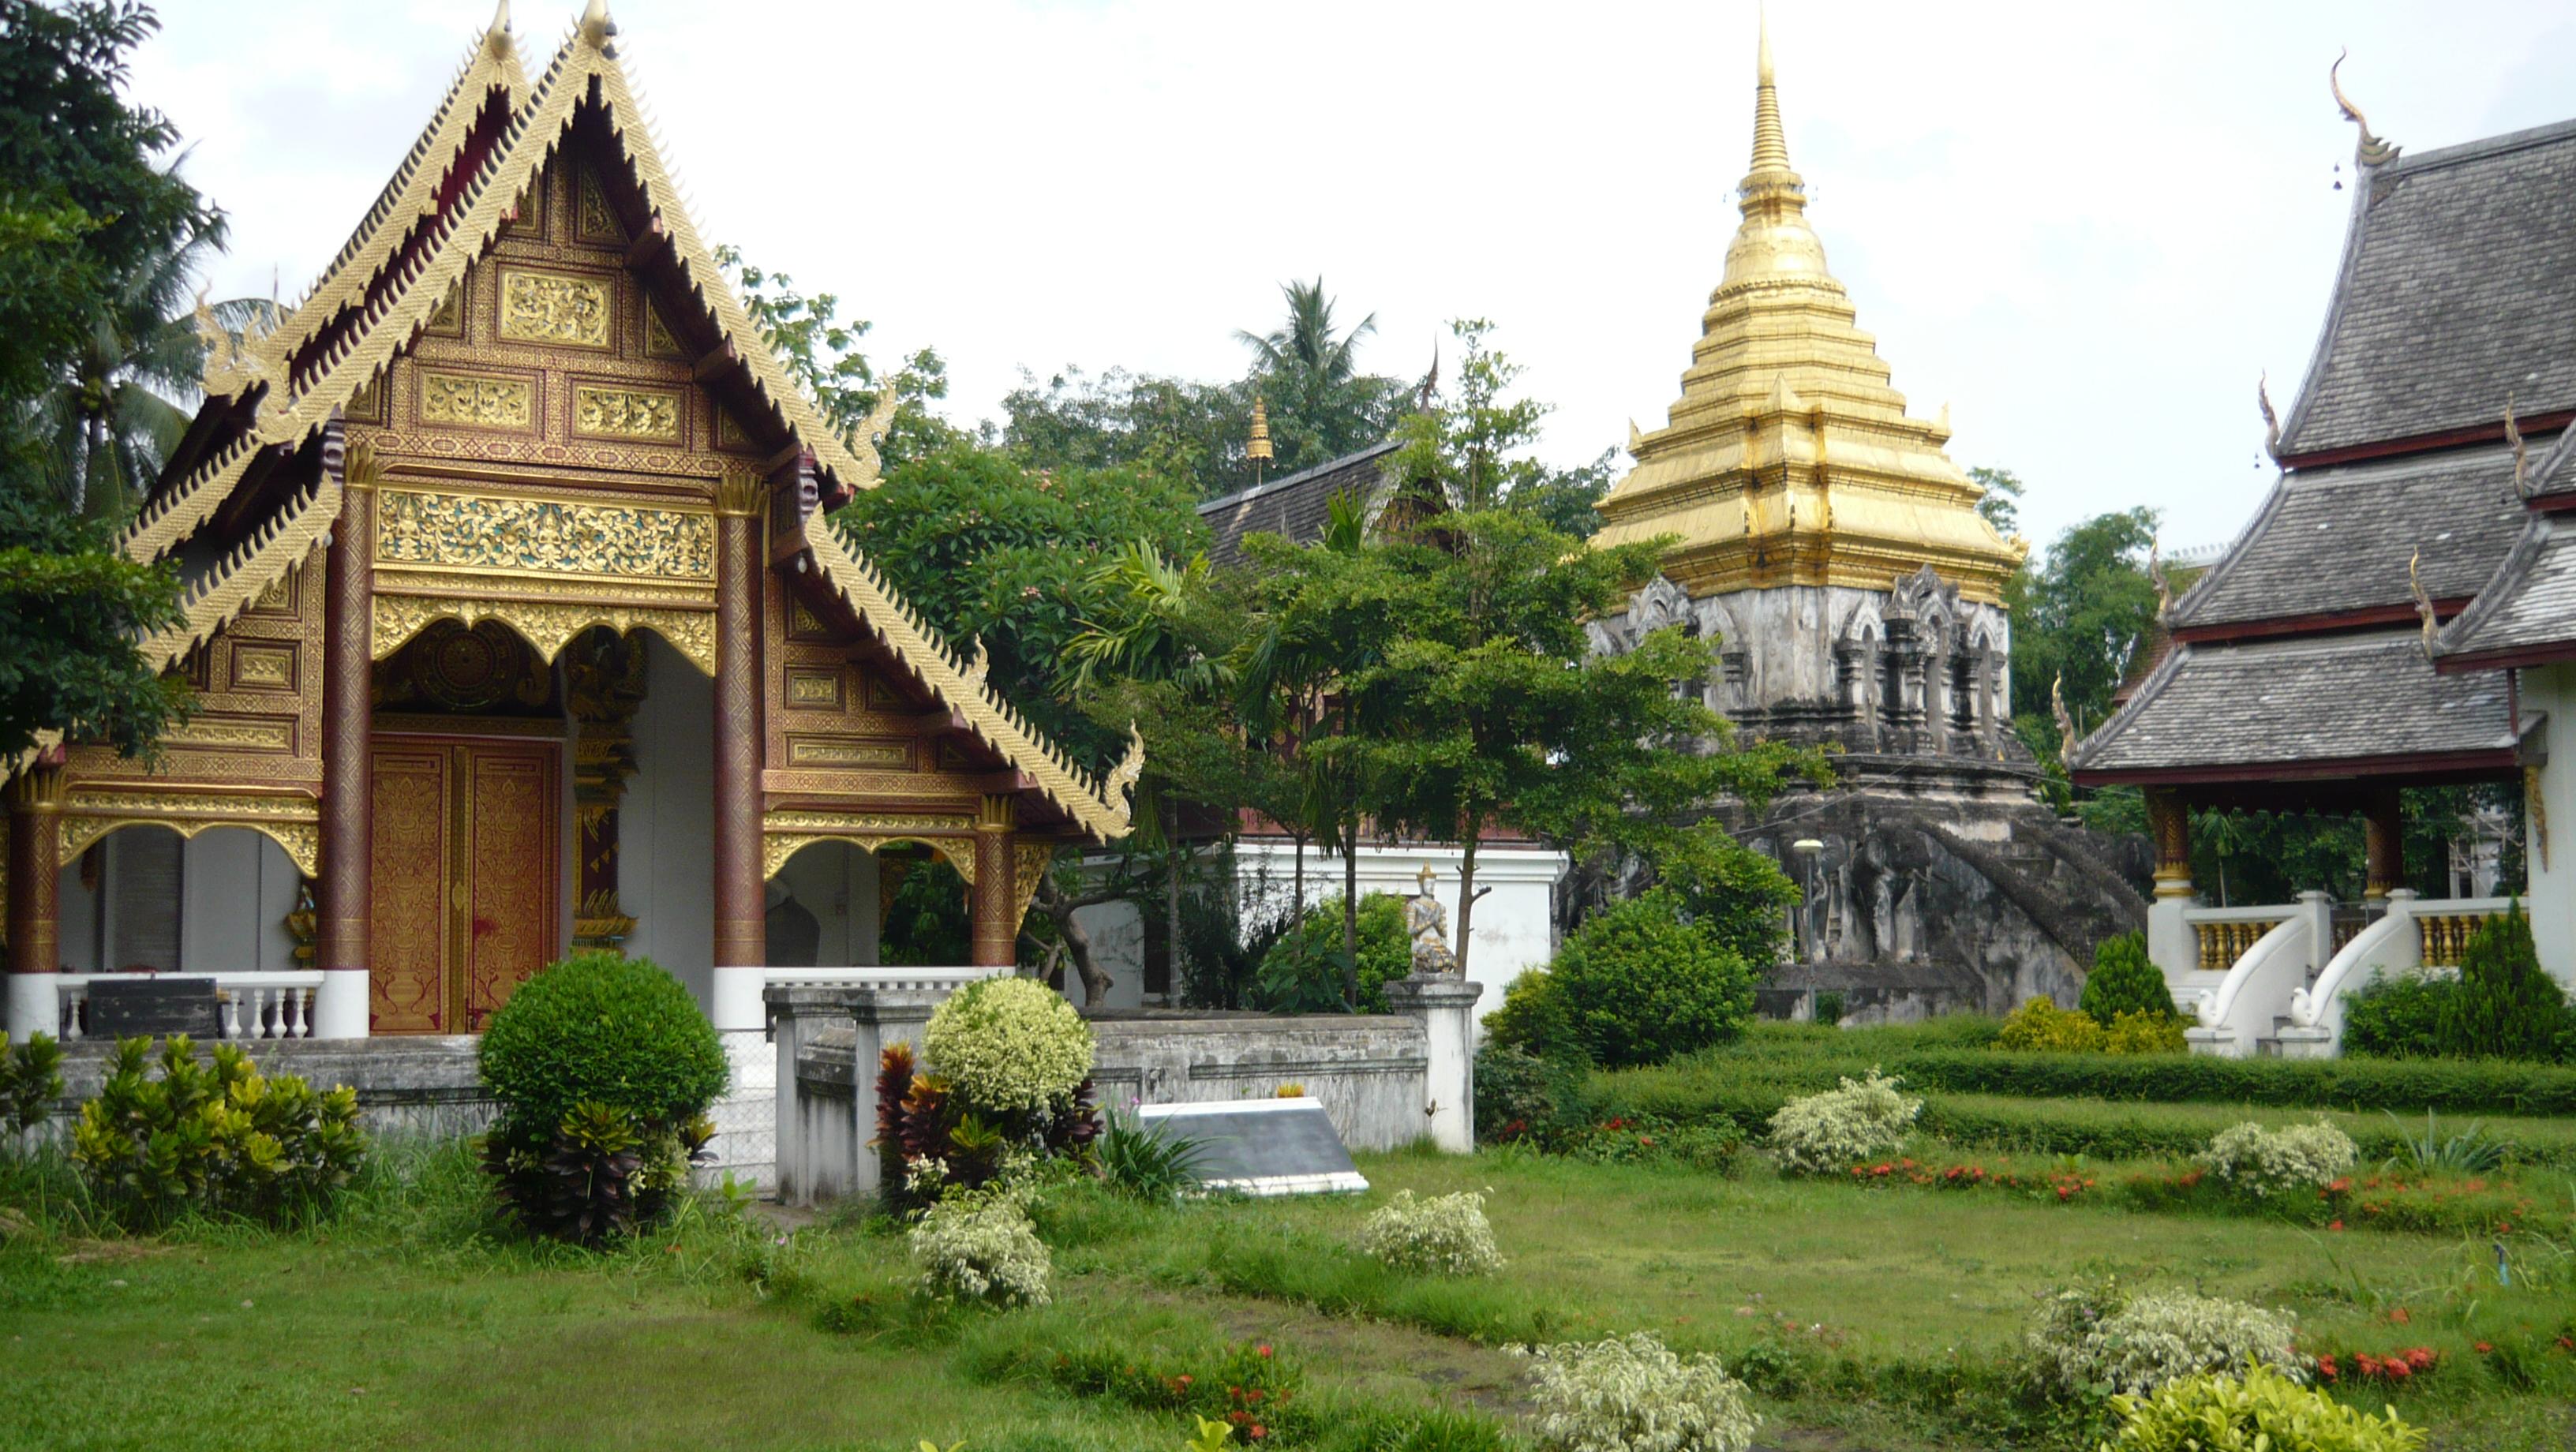 File:Chiang Mai, Wat Chiang Man.jpg